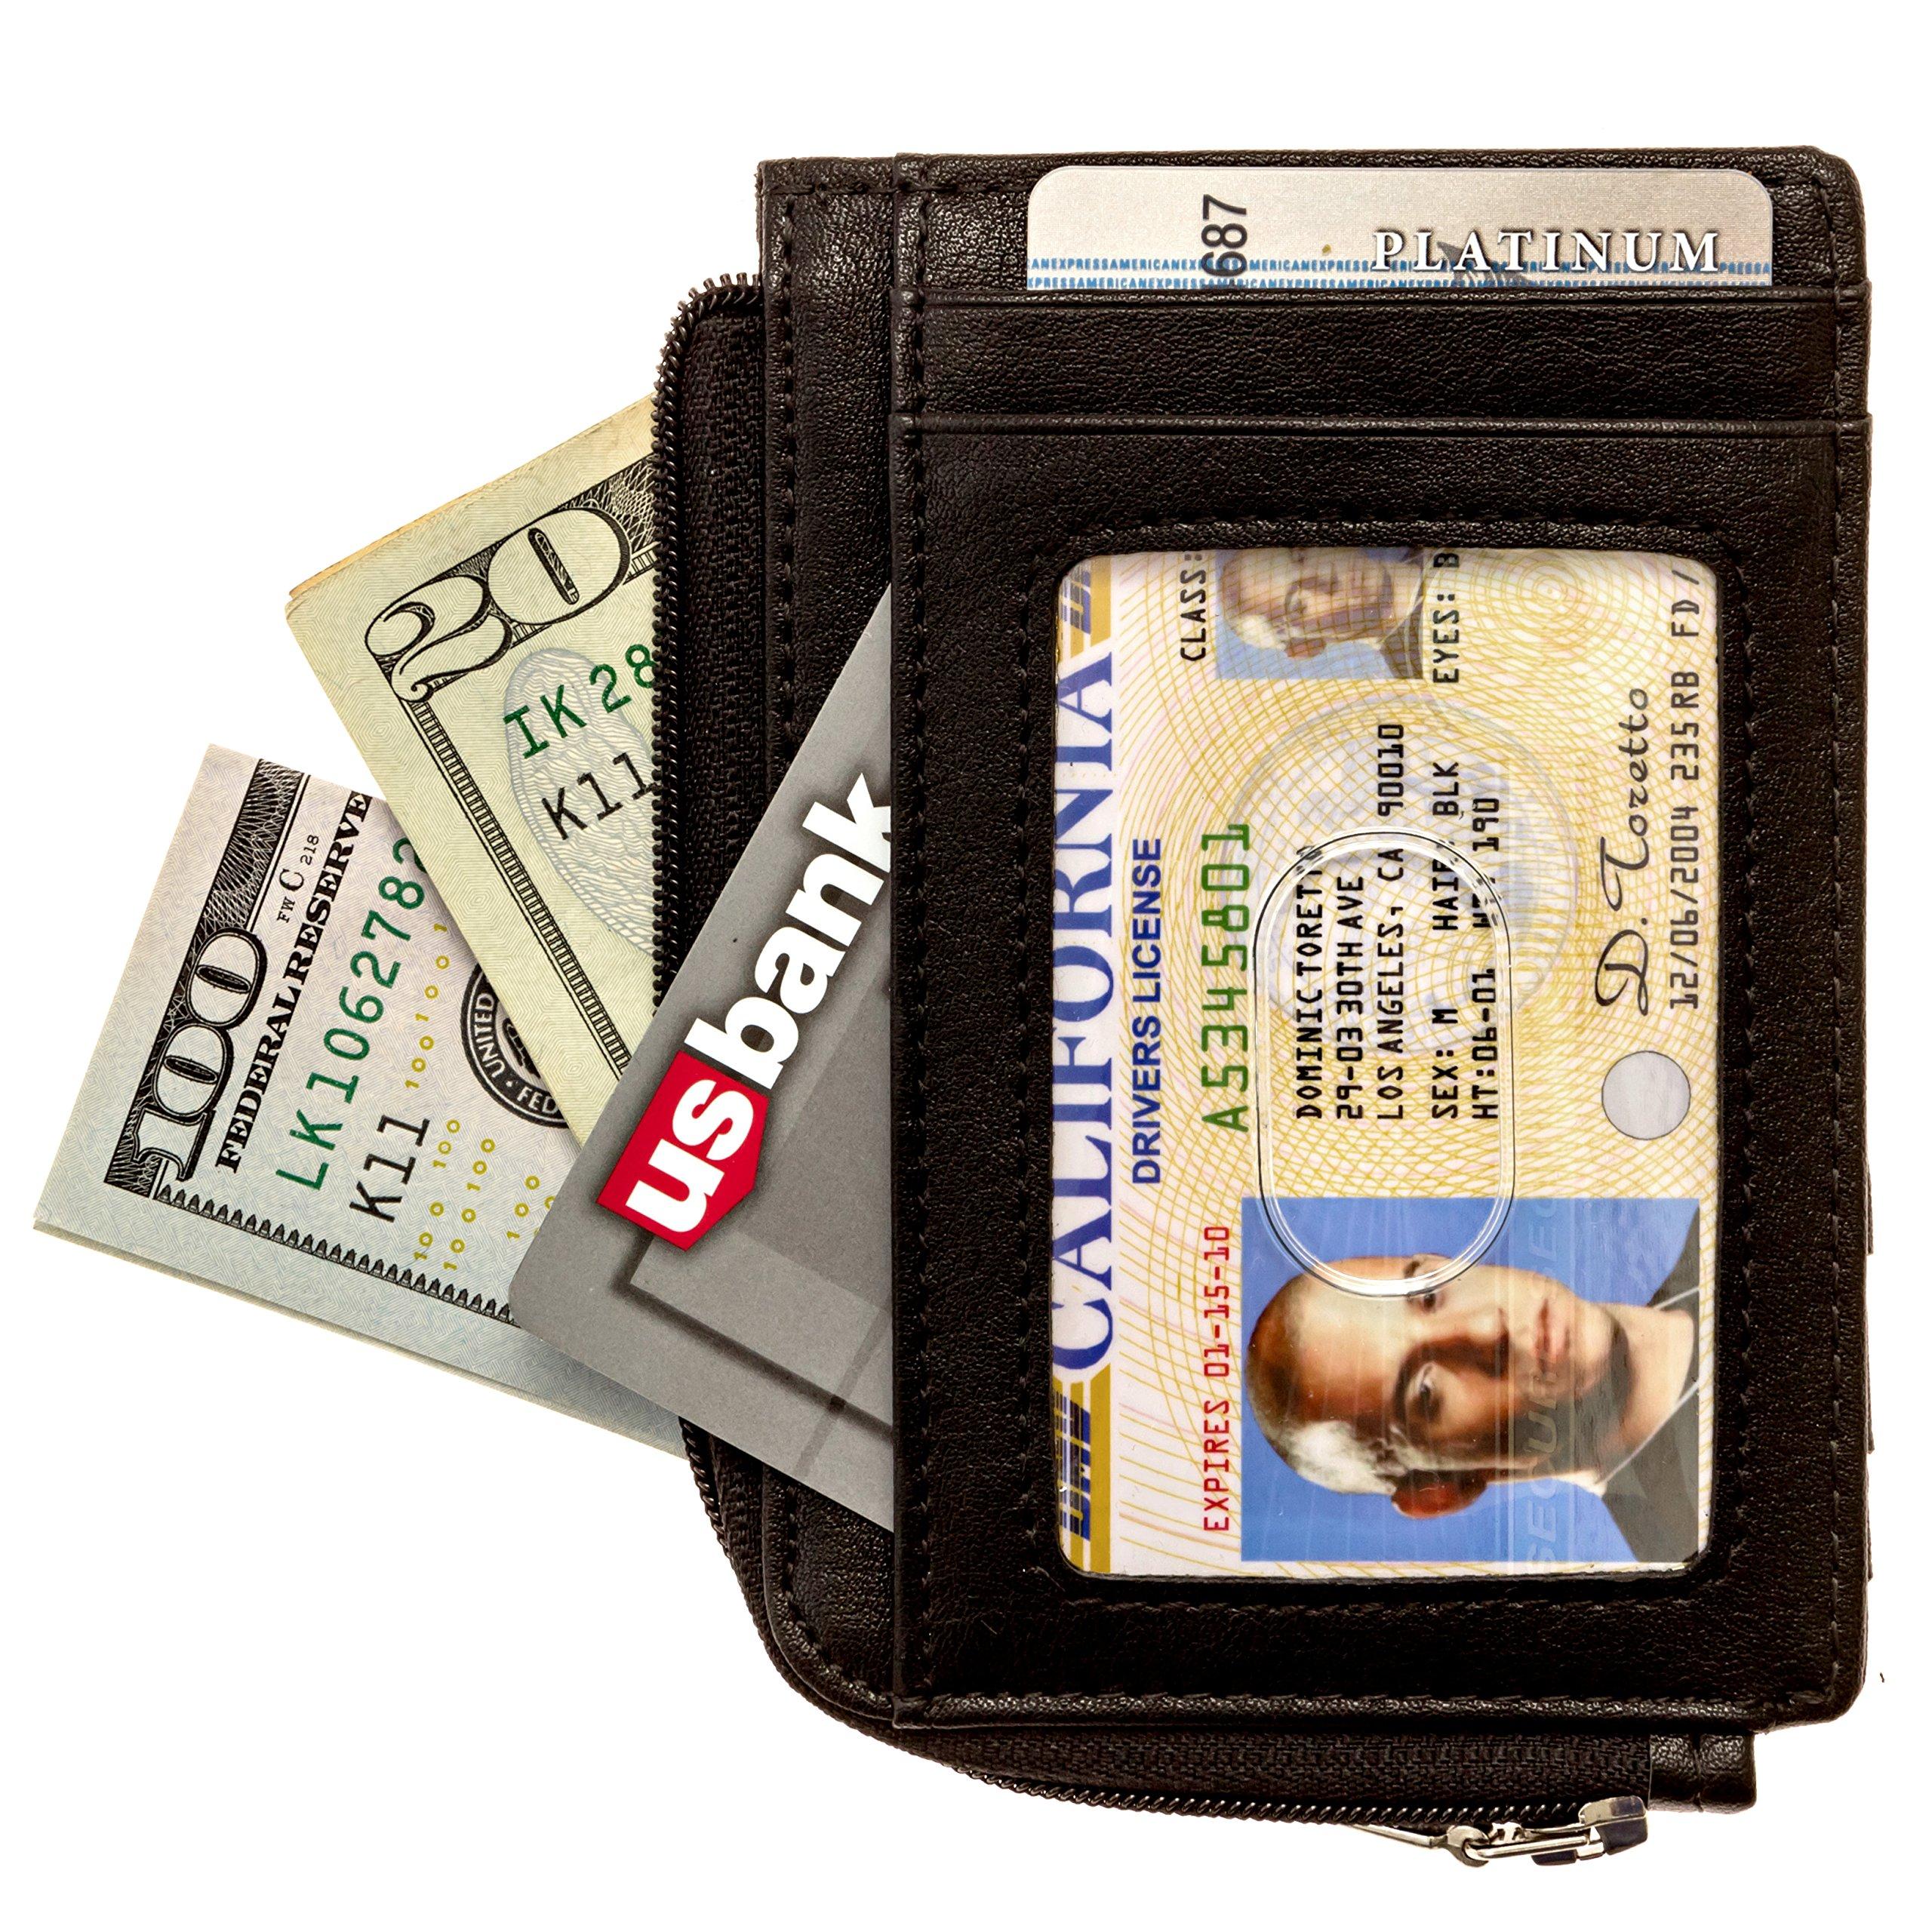 Full Voyage RFID Blocking Slim Wallet FV08 with Window for ID Badge, 7 Card Holder Slots - 270-Degree Zipper - Black Leather